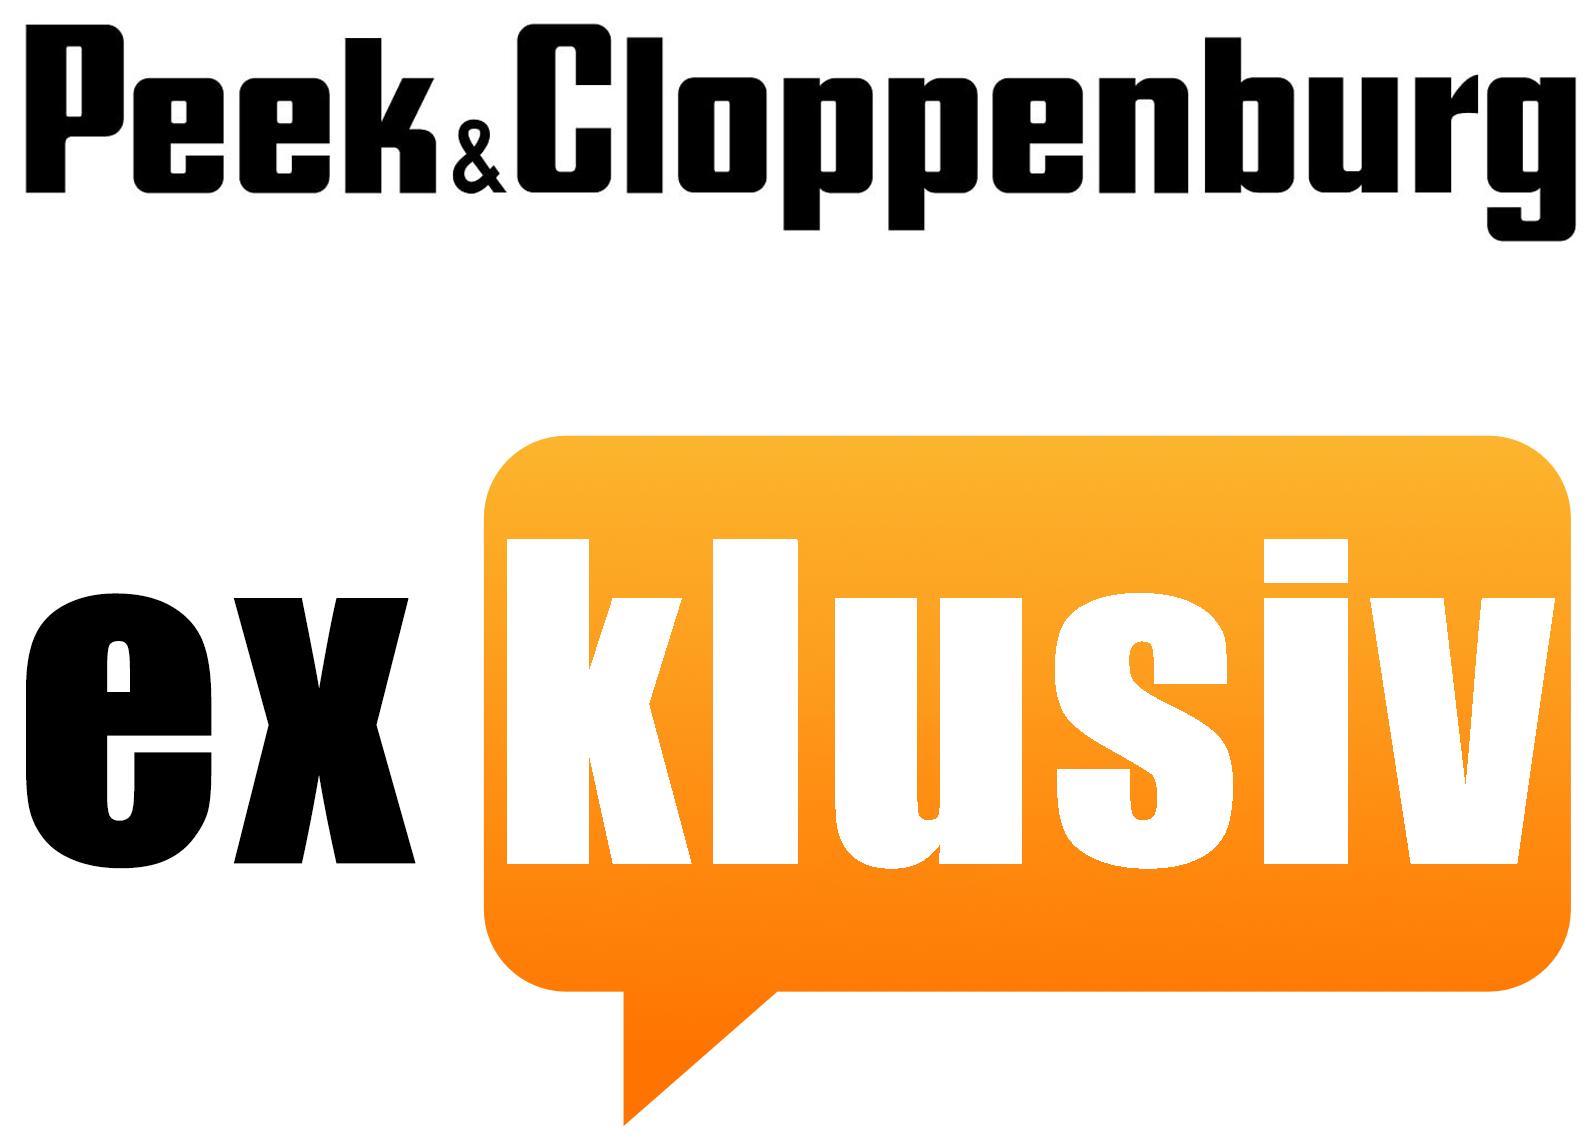 Peek & Cloppenburg / Preisjäger exklusiv: 15% Rabatt auf ALLES